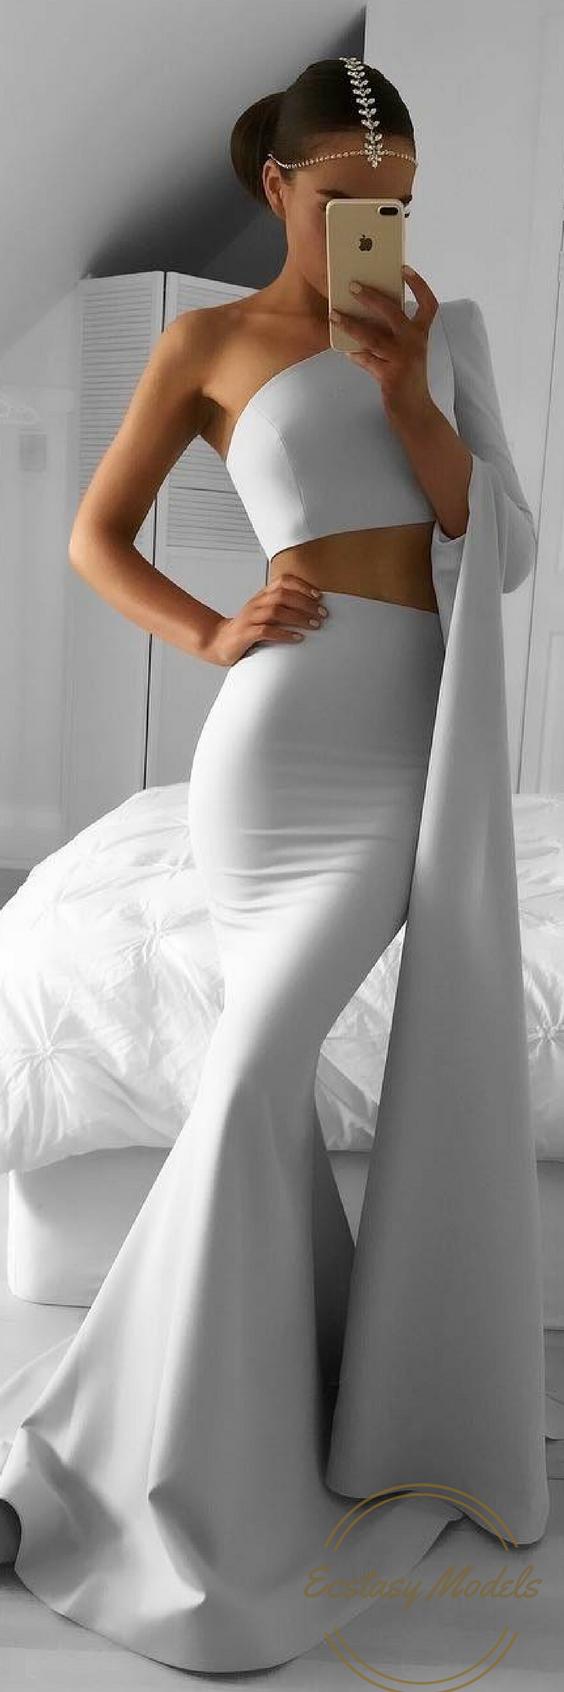 Jennifer 2 Piece By Portiaandscarlett Fashion Look By Emma Spiliopoulos Piece Prom Dress White Prom Dress Prom Dresses Two Piece [ 1692 x 564 Pixel ]